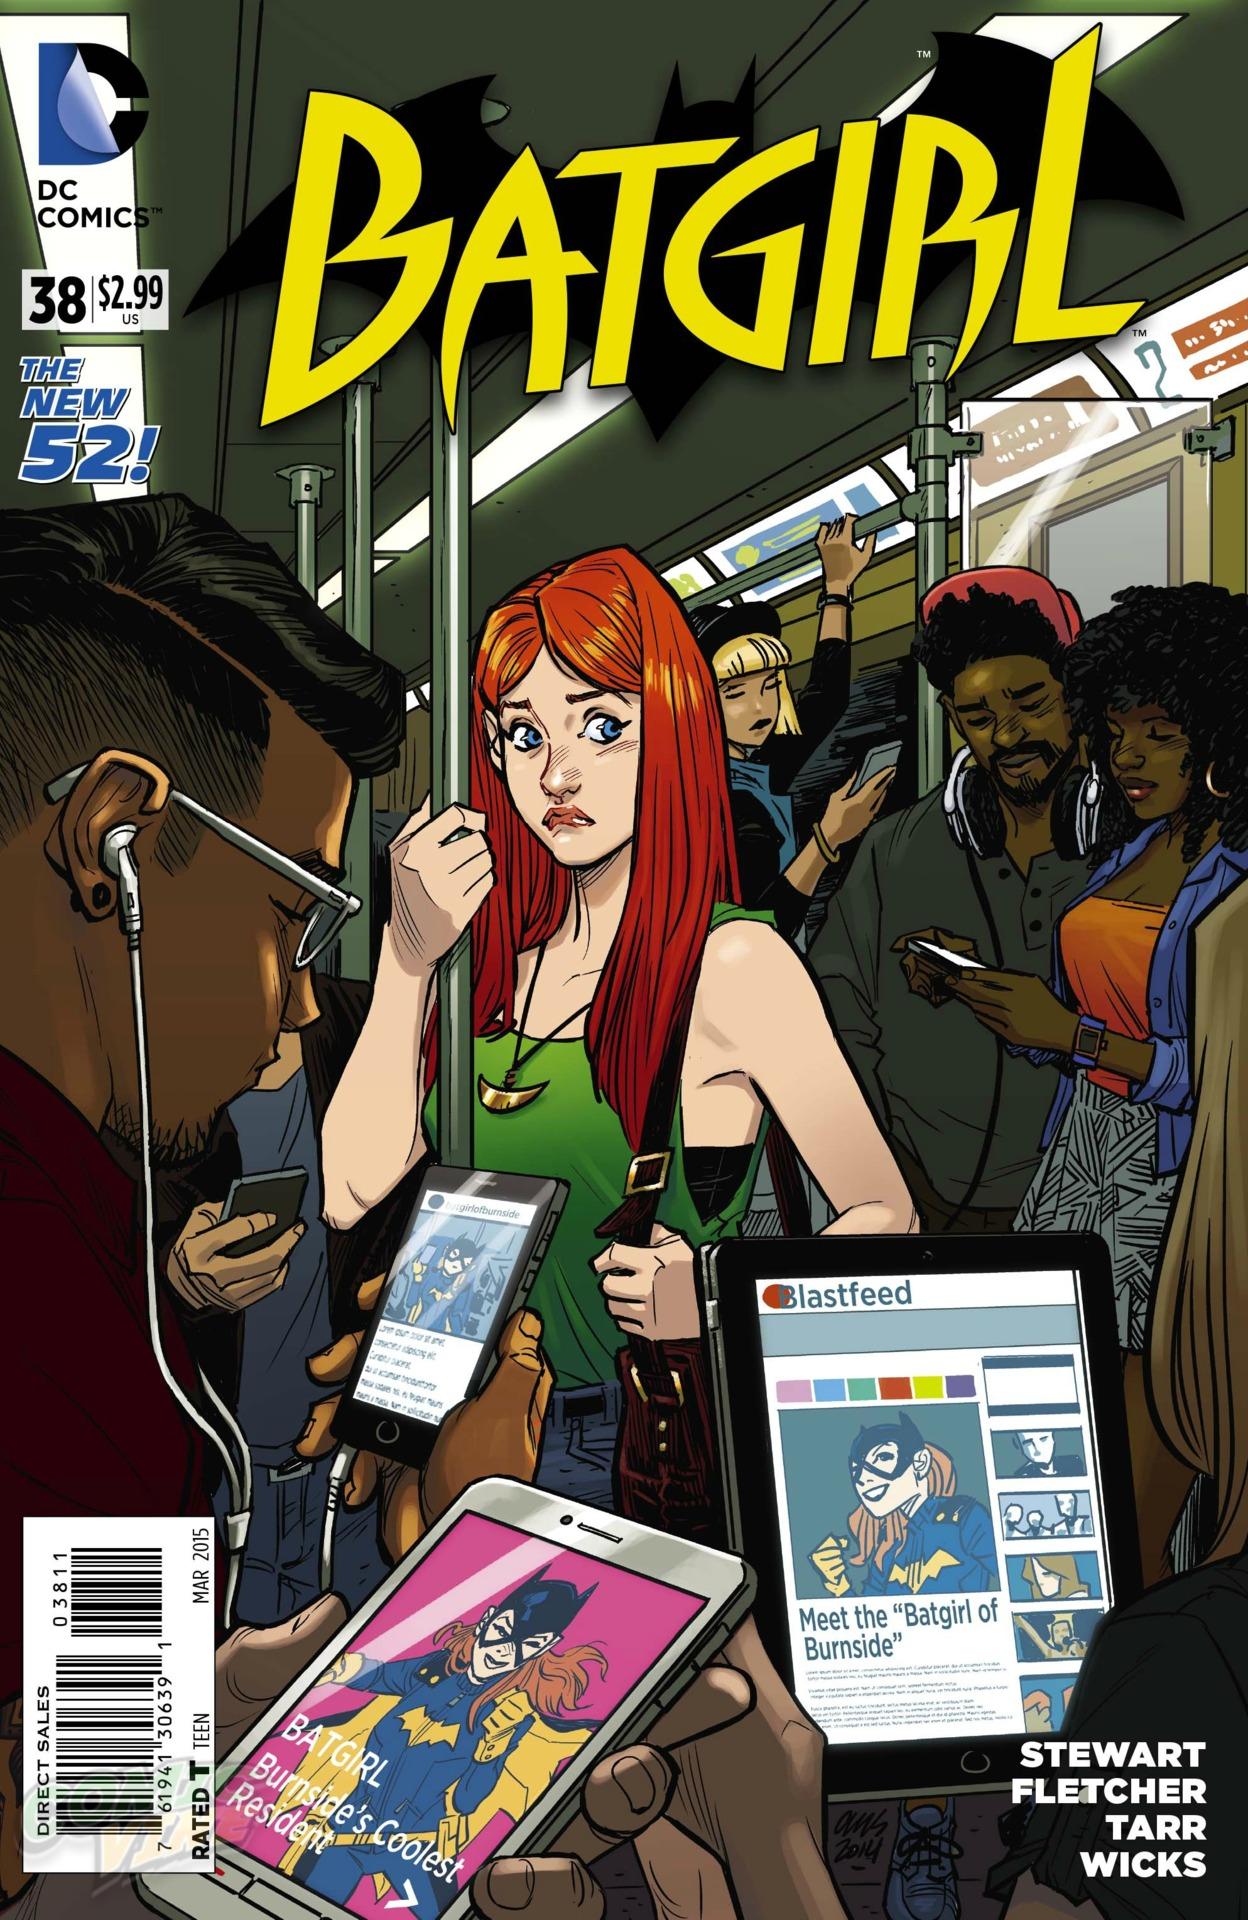 BATBOOK OF THE WEEK: Batgirl #38 | 13th Dimension, Comics ...